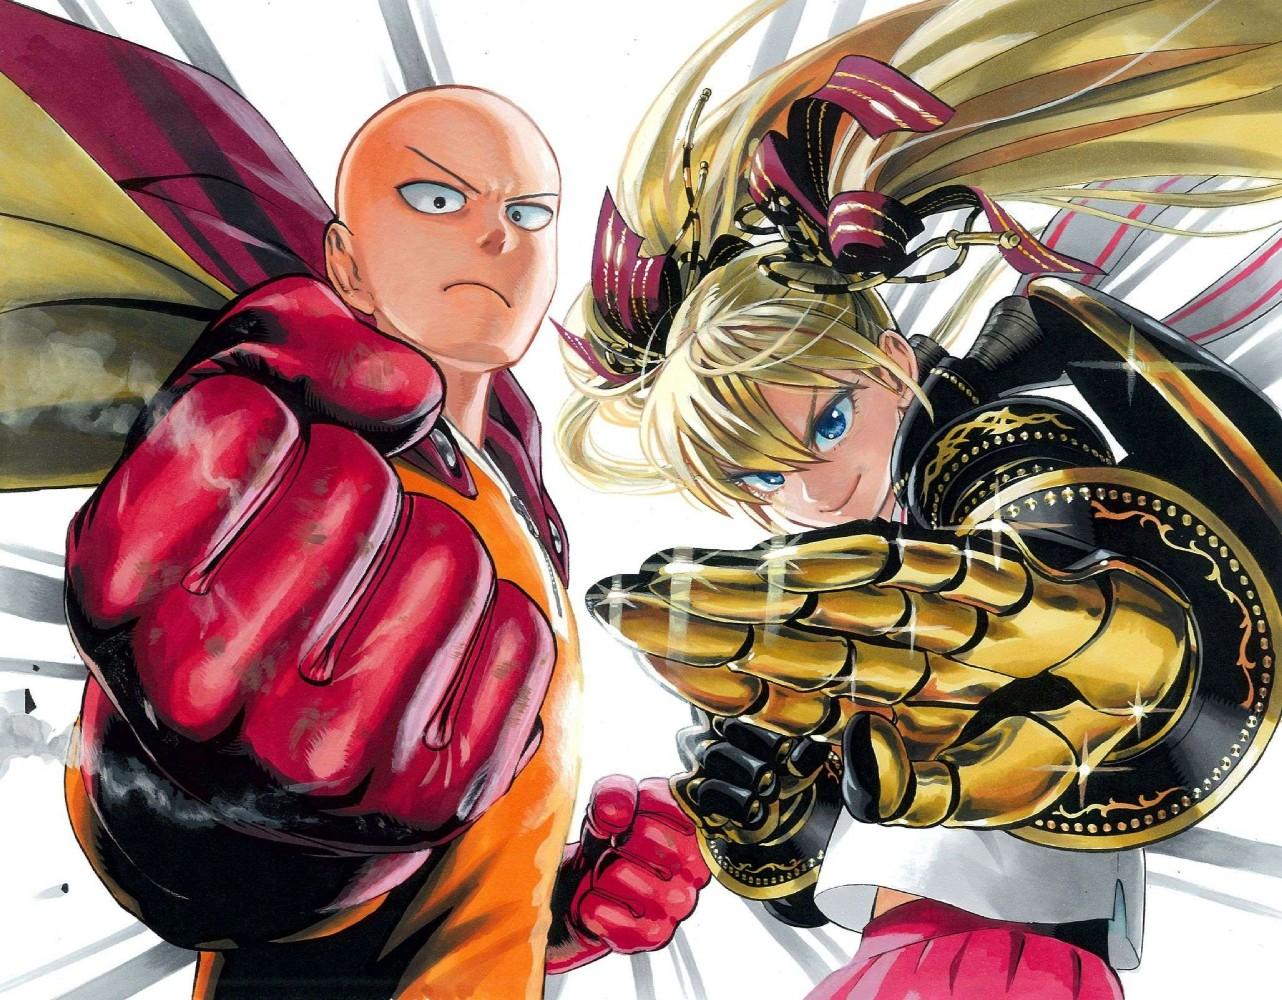 Saitama Wallpaper - One Punch Man Wallpaper HD Saitama by corphish2 on DeviantArt